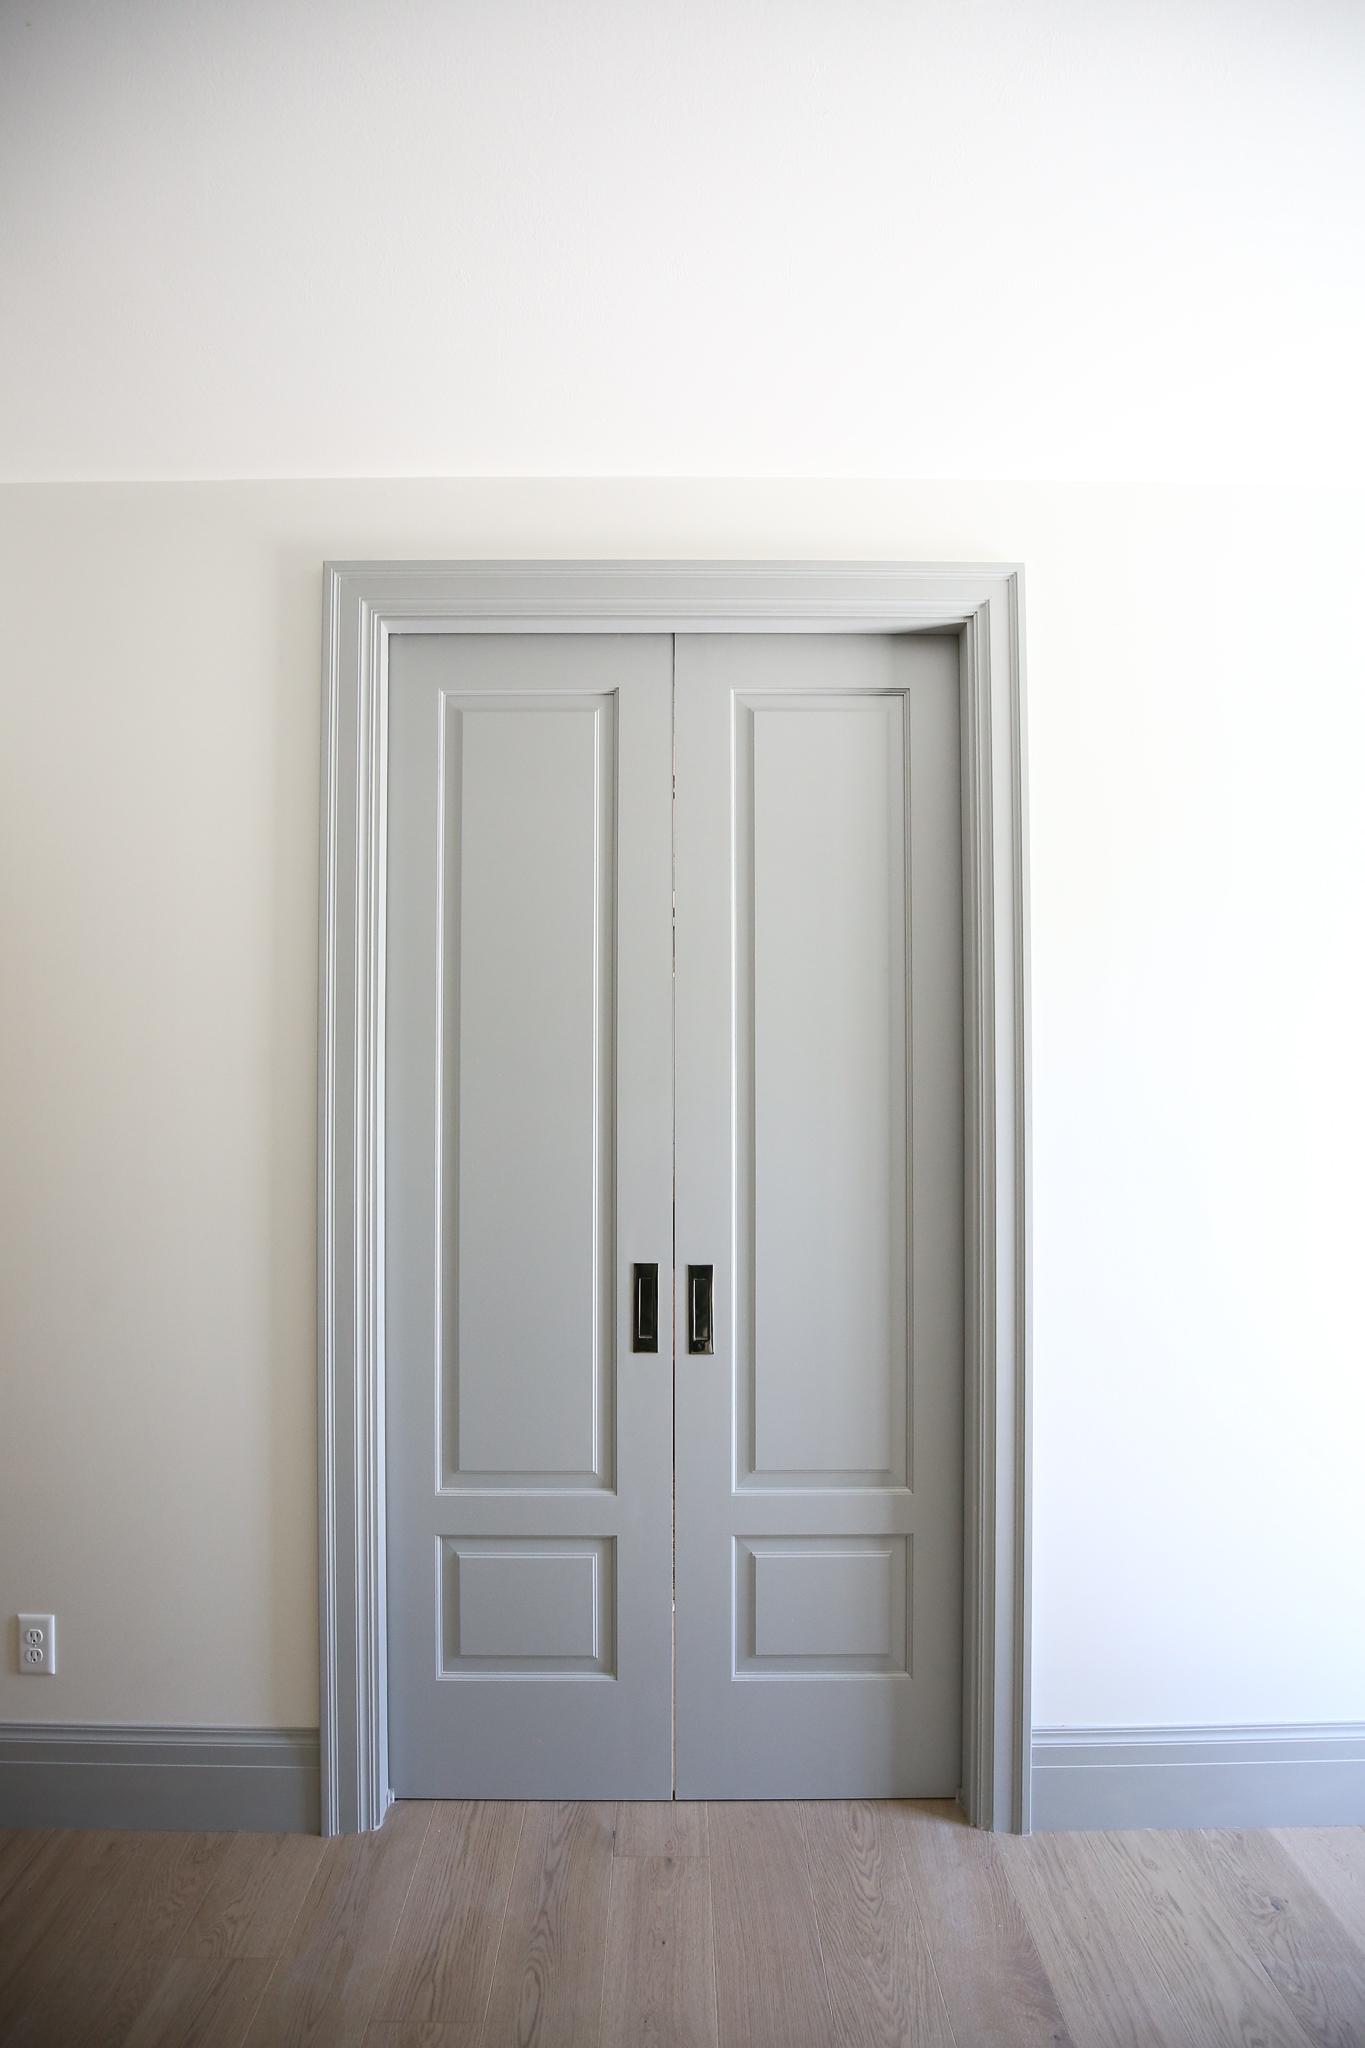 Installing Pocket Doors In The Closet Chris Loves Julia